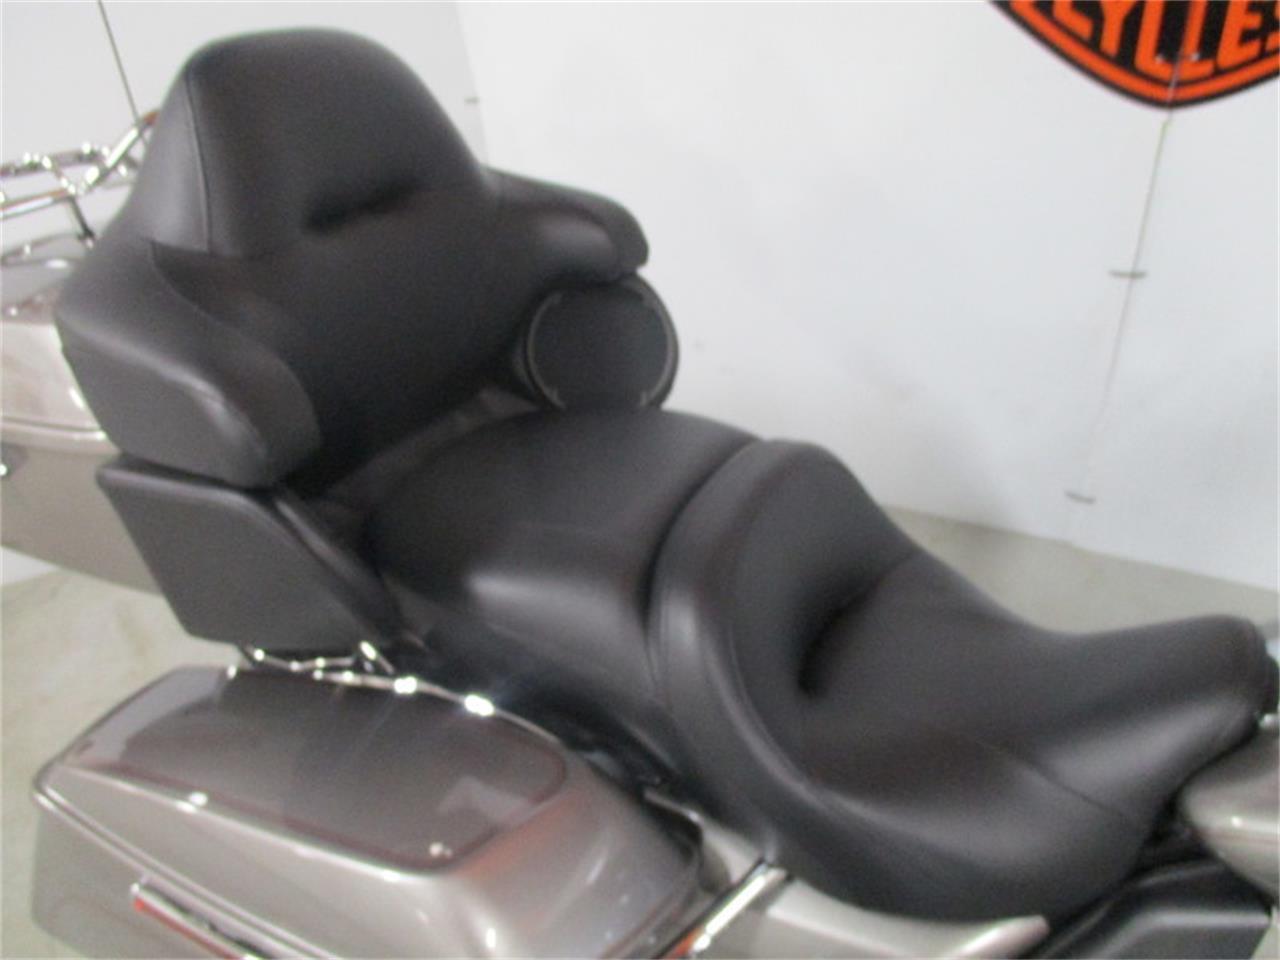 Large Picture of '16 FLHTCU - Electra Glide® Ultra Classic® - M9DO